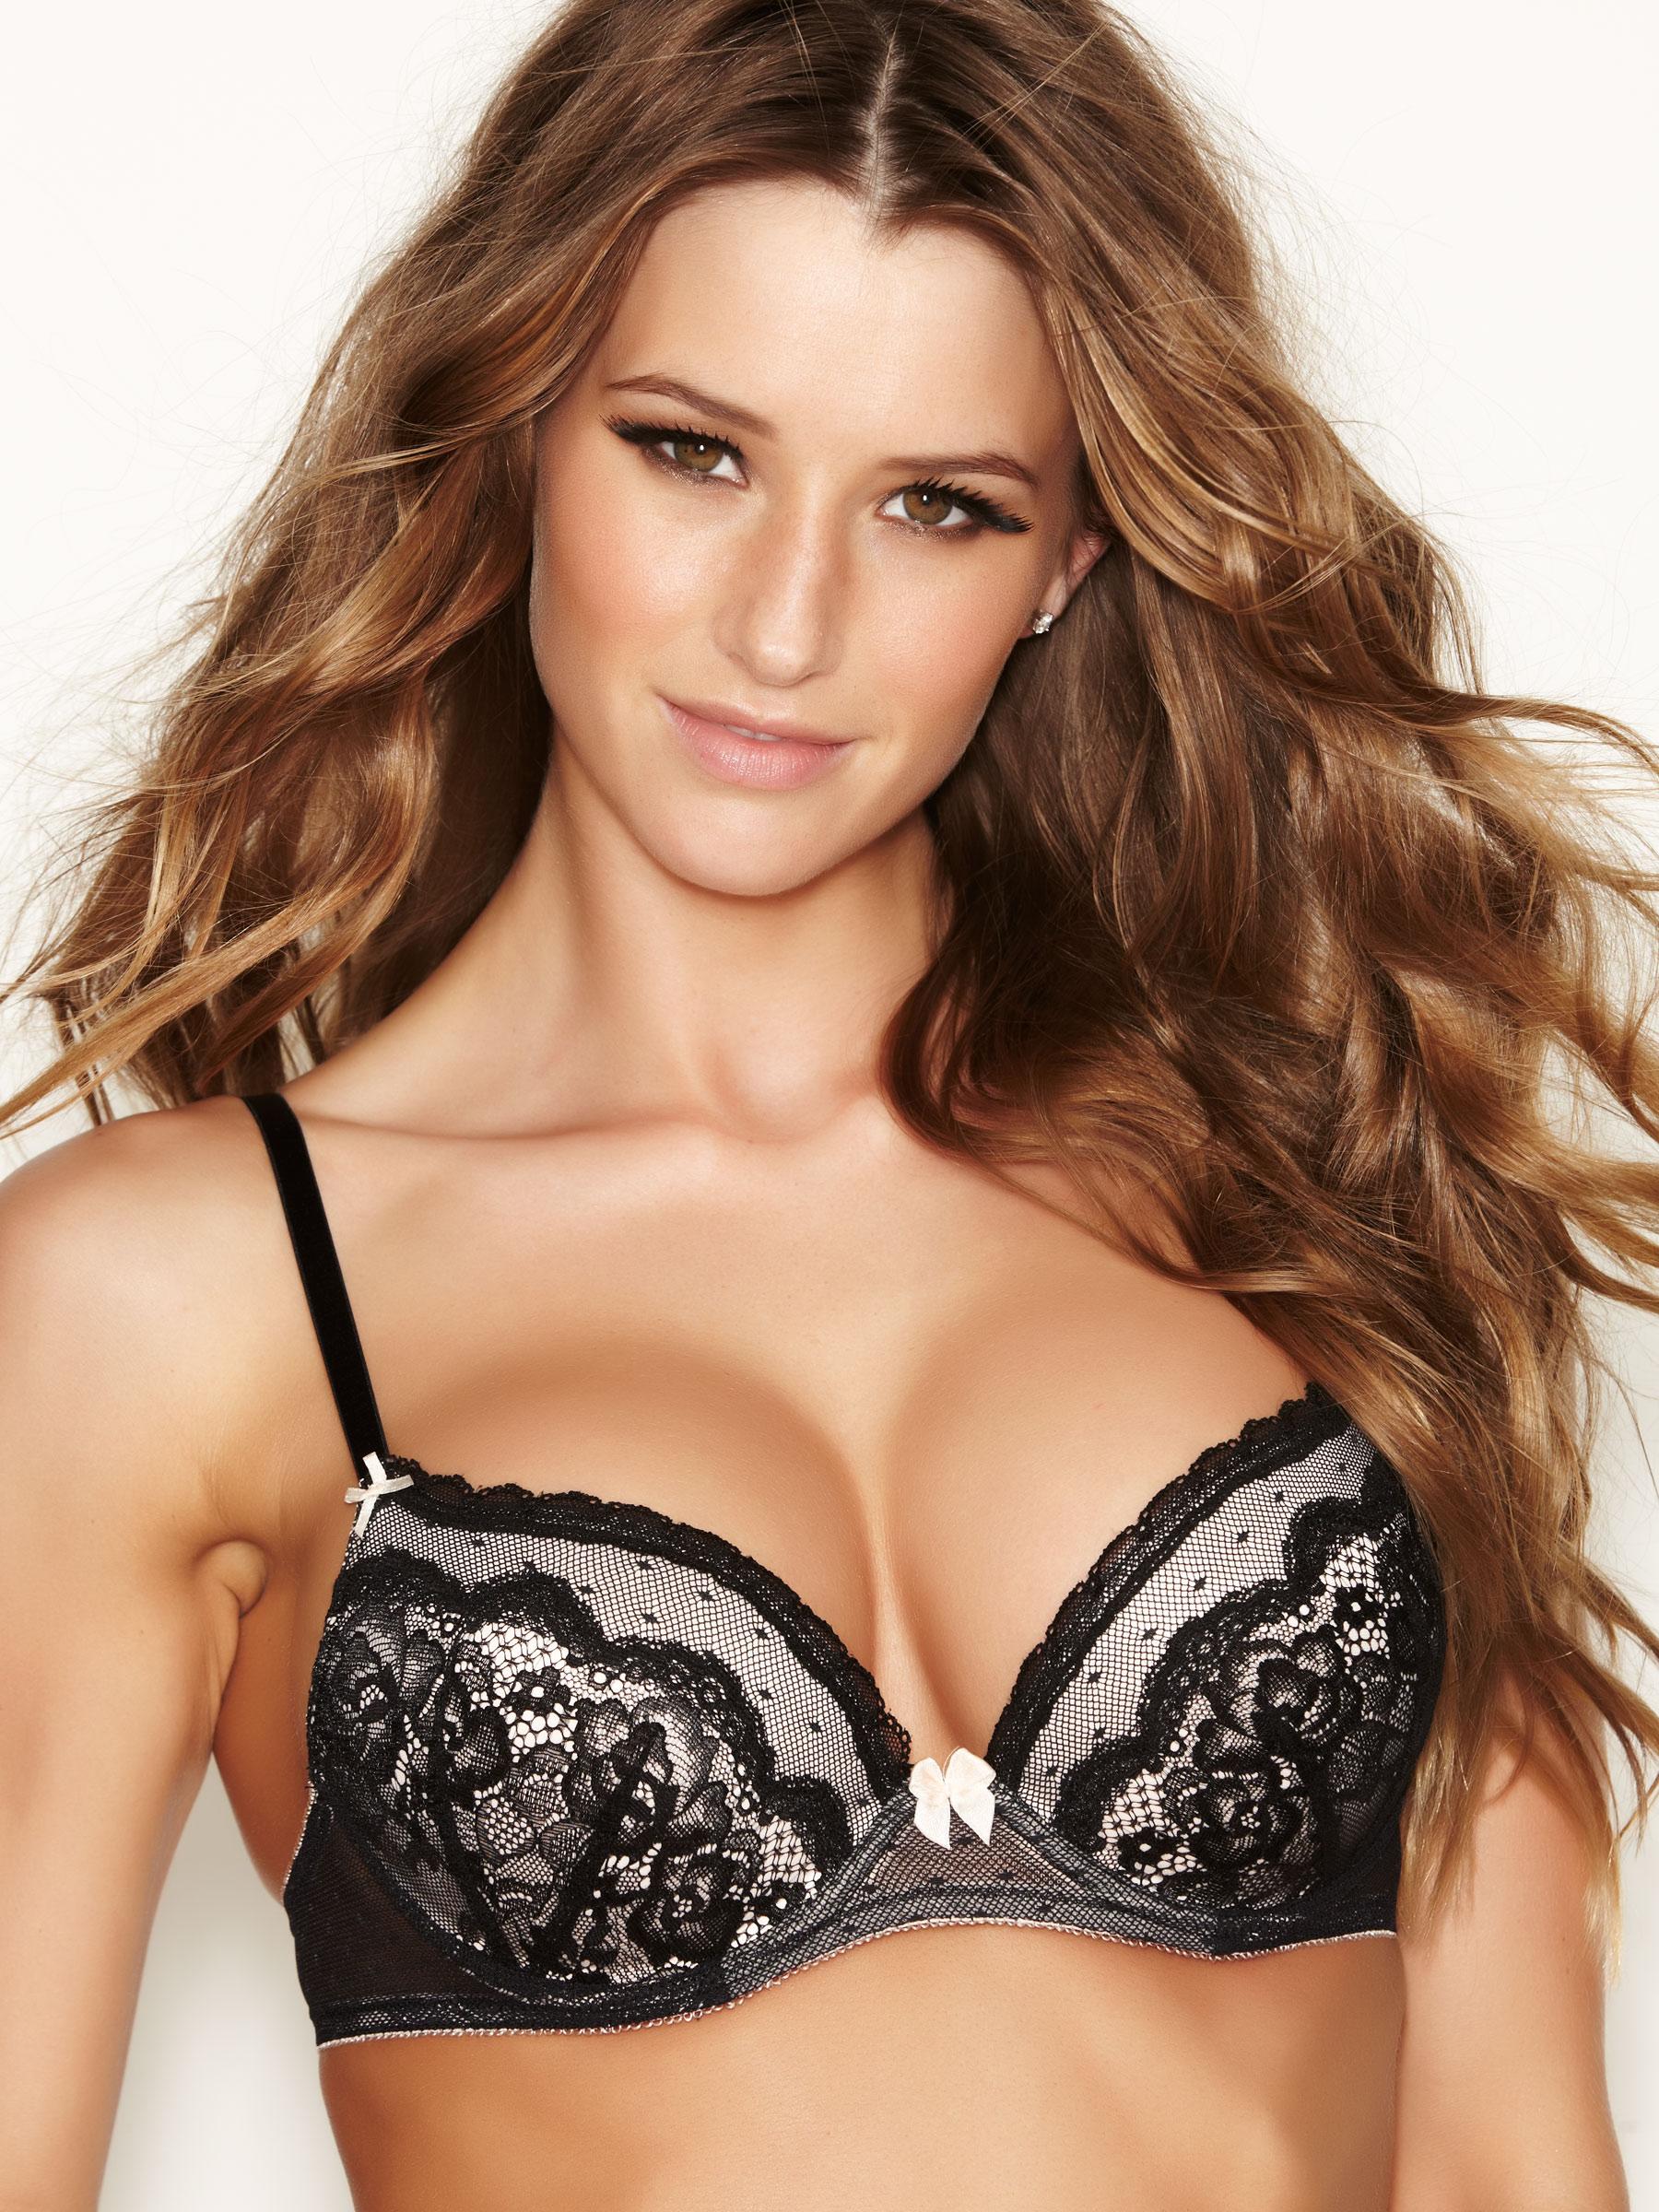 ef40cc482eb Ann Summers Womens Sexy Lace Black Padded T-Shirt Bra Underwear Erotic  Lingerie